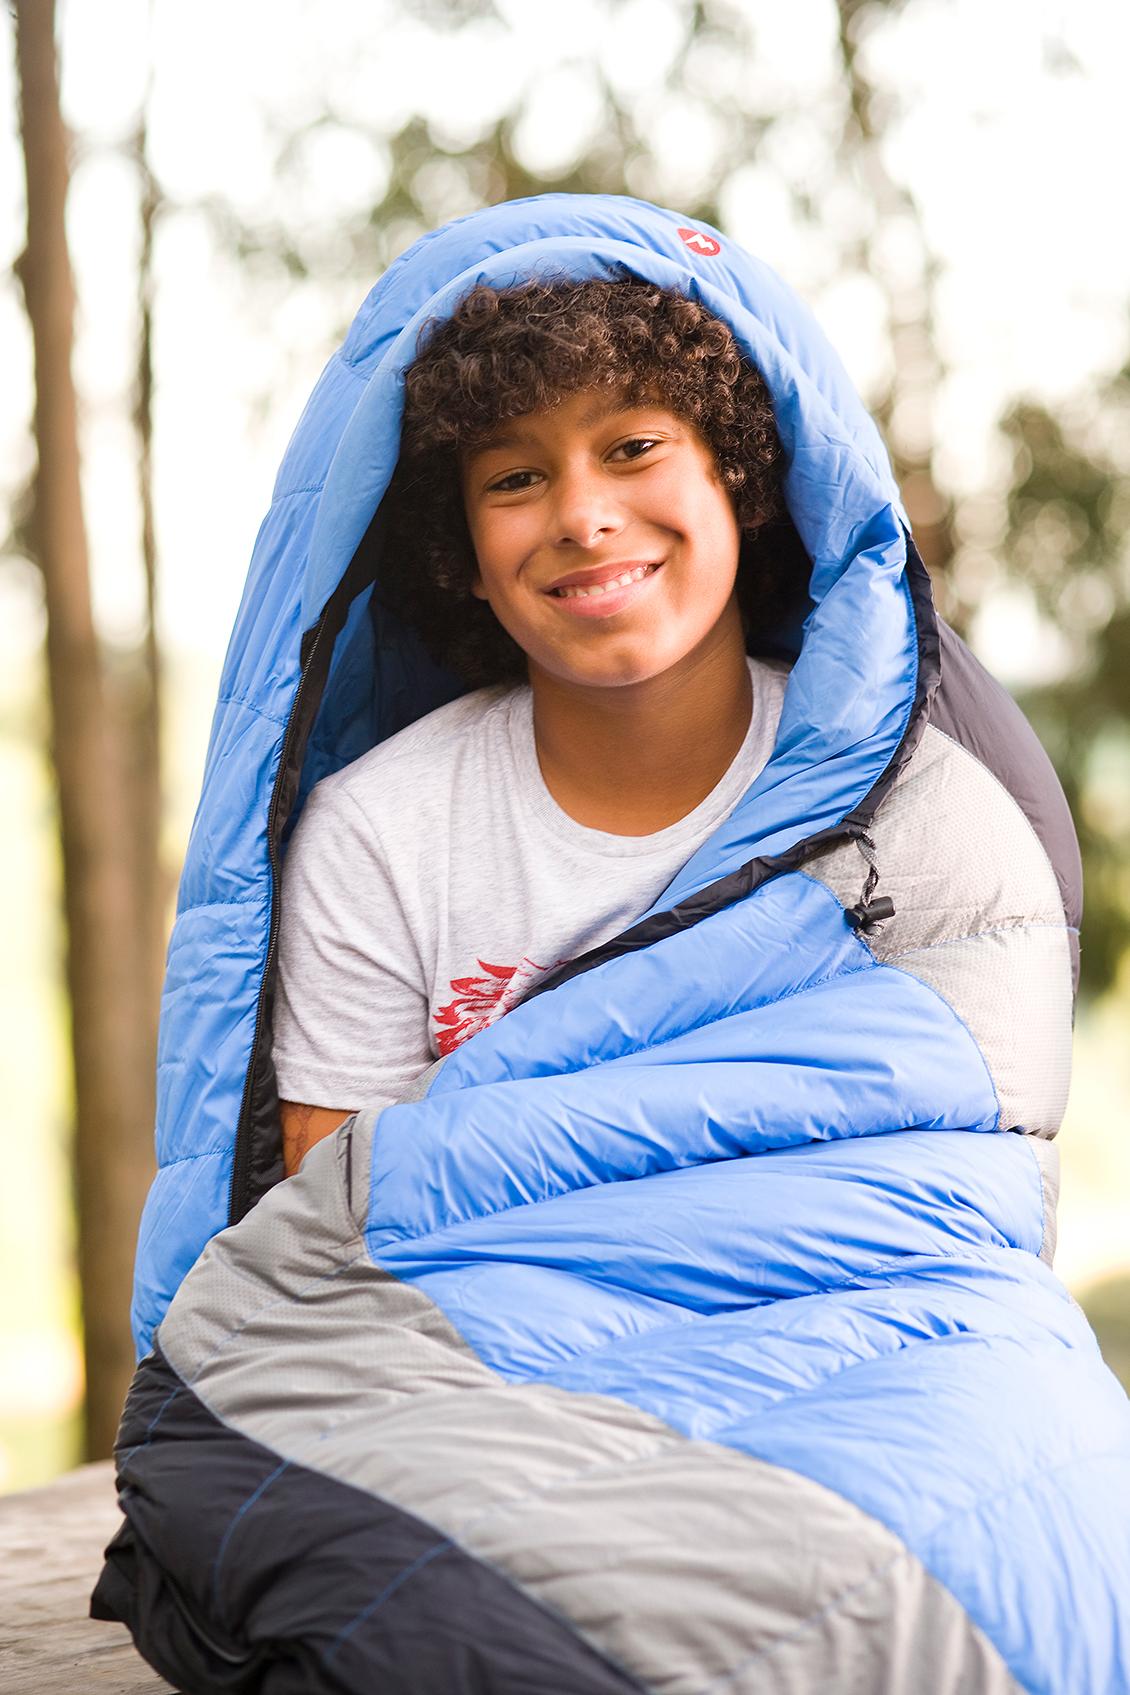 boy camping in sleeping bag